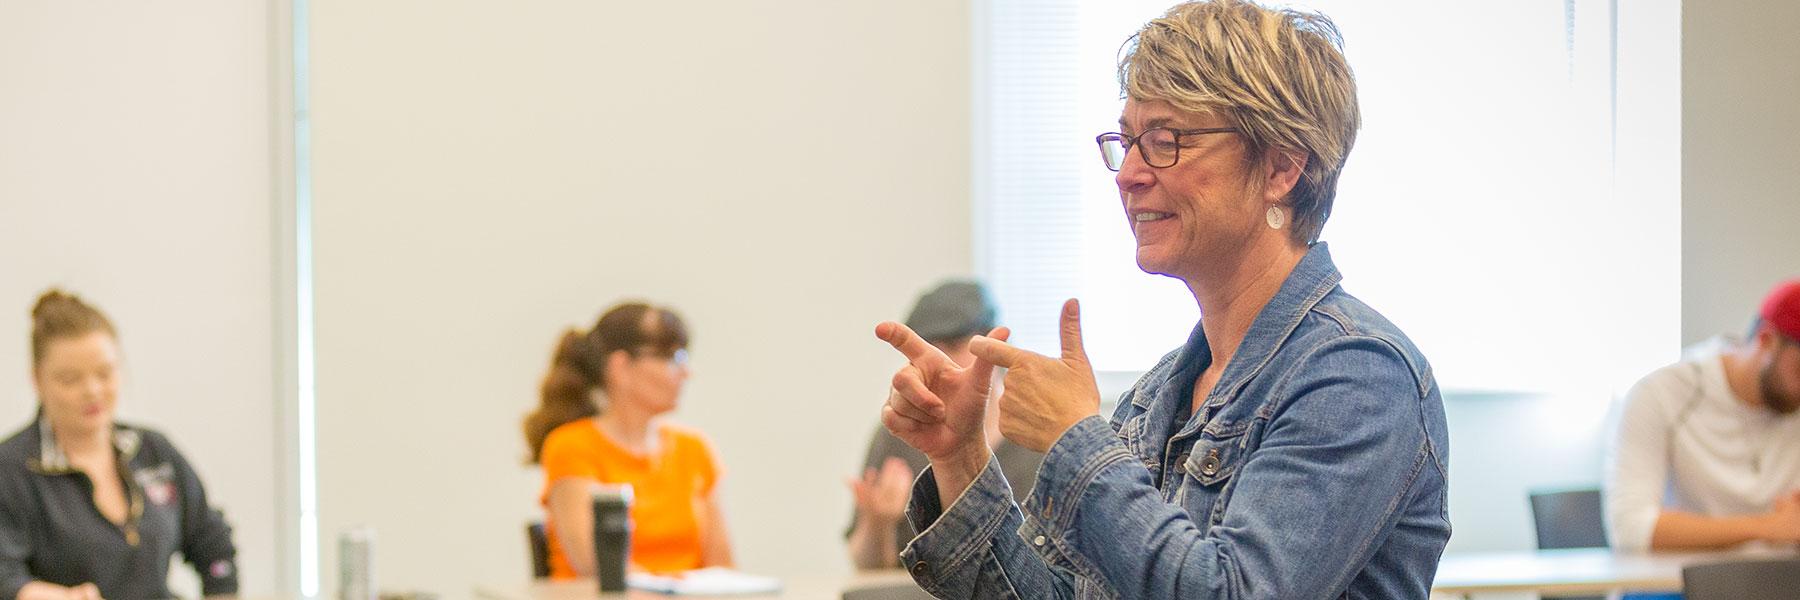 Crista Browne-Krosch, an instructor in the BLC American Sign Language department, teaches an ASL class.